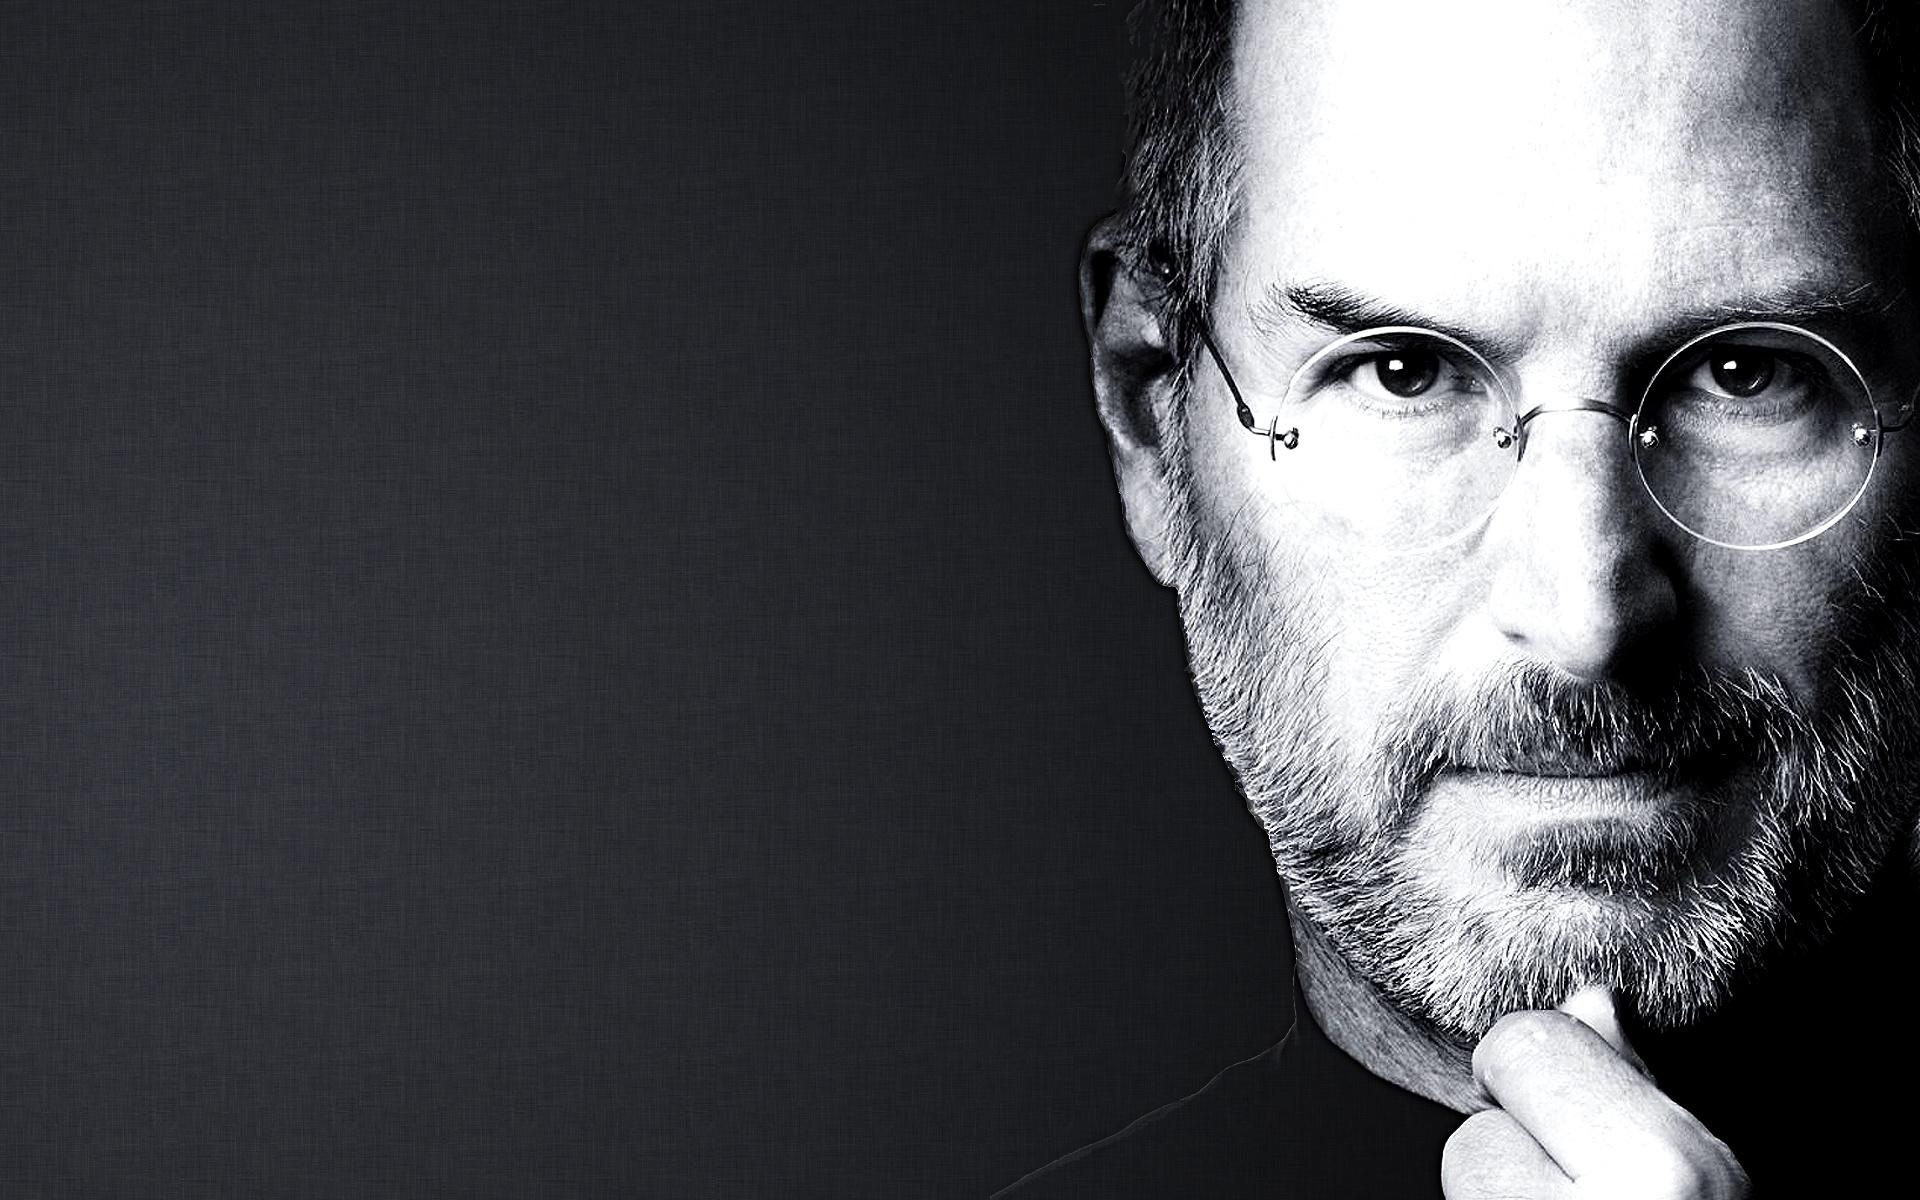 FunMozar Steve Jobs Wallpapers 1920x1200